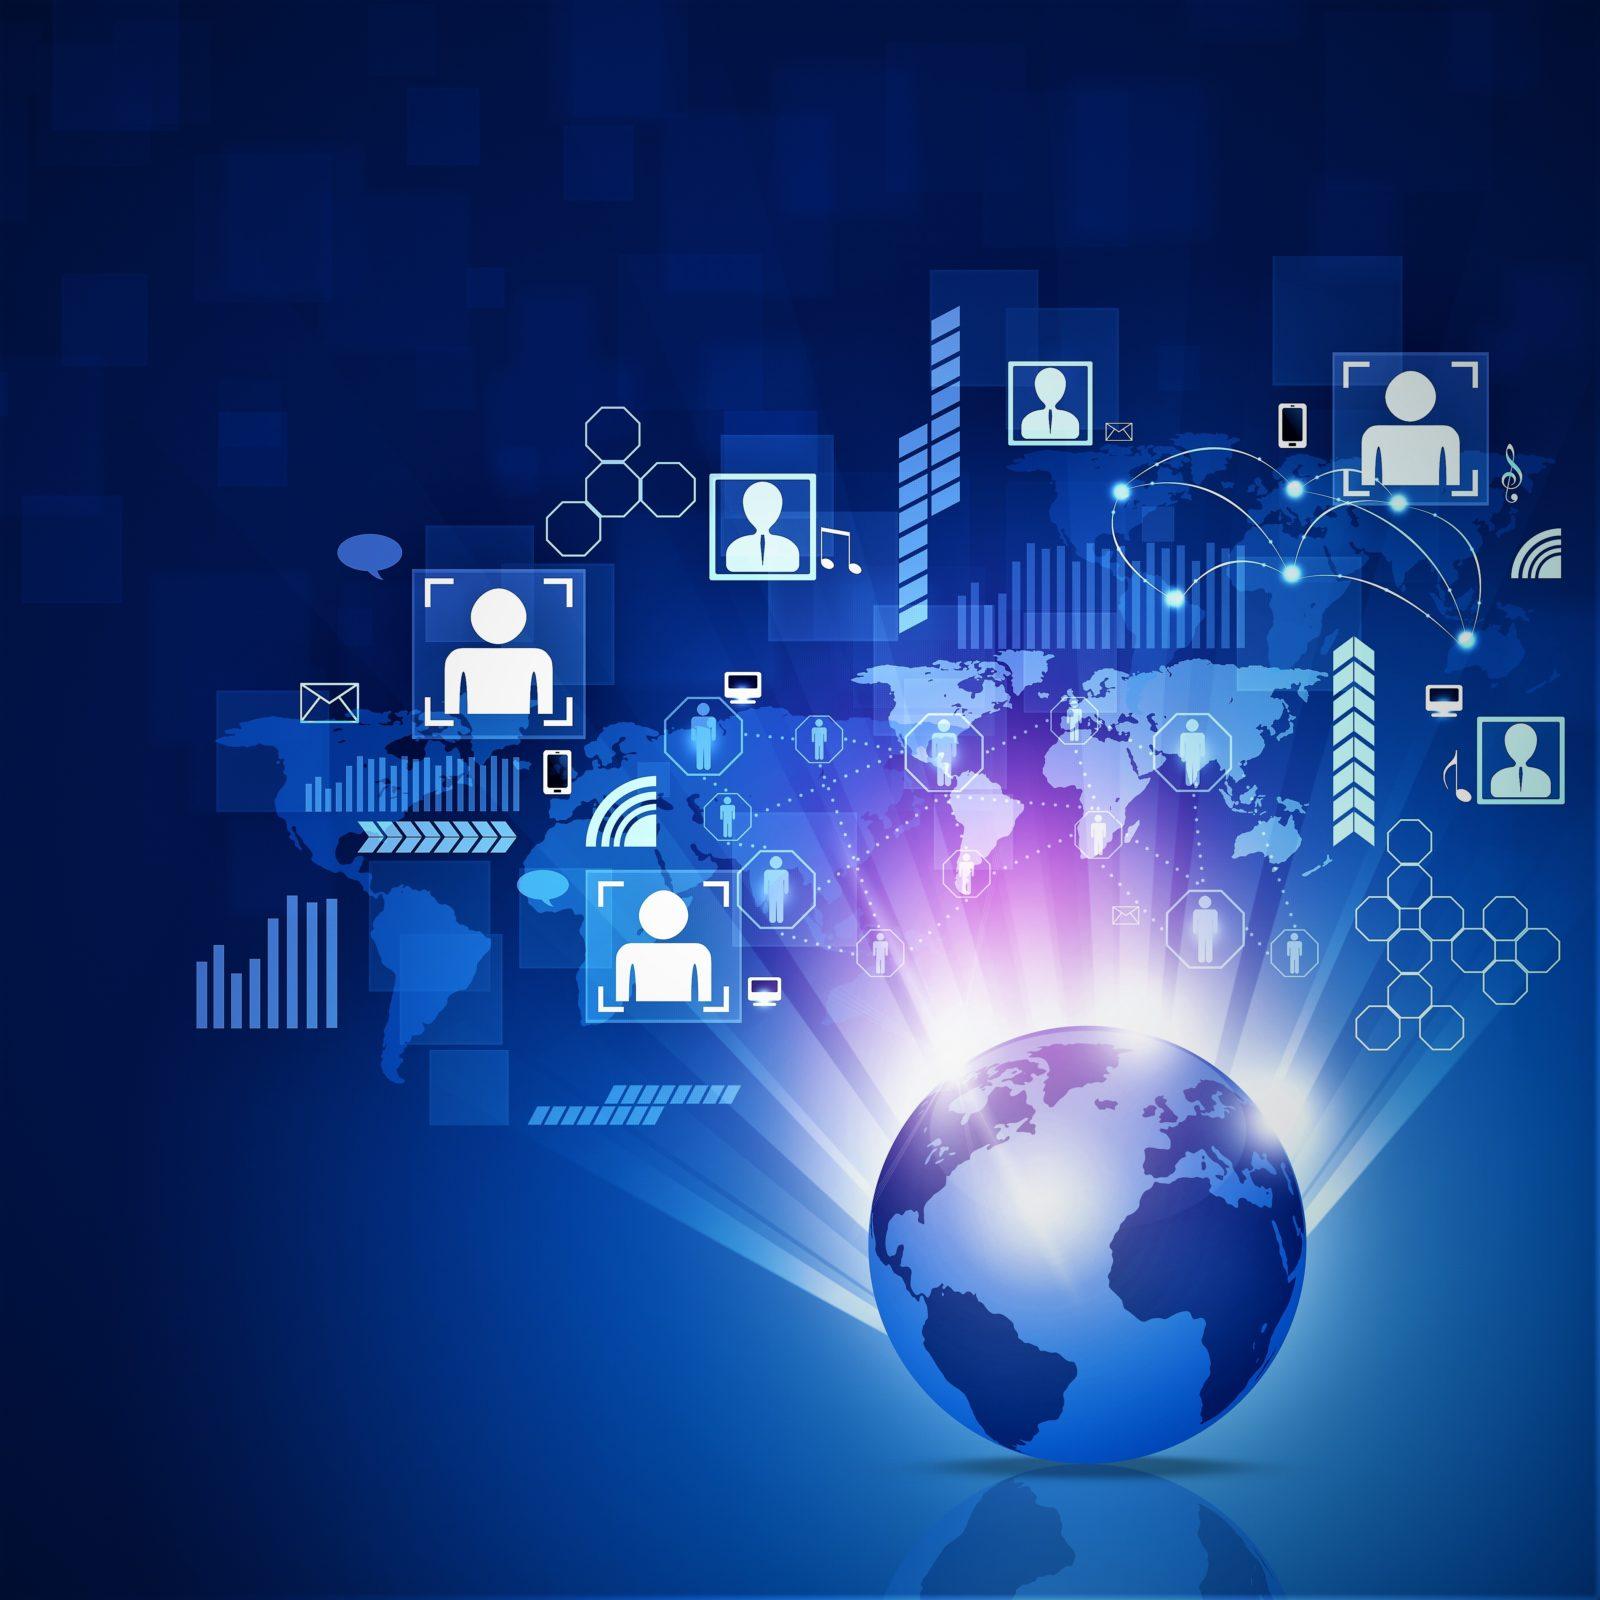 World Business Network Background